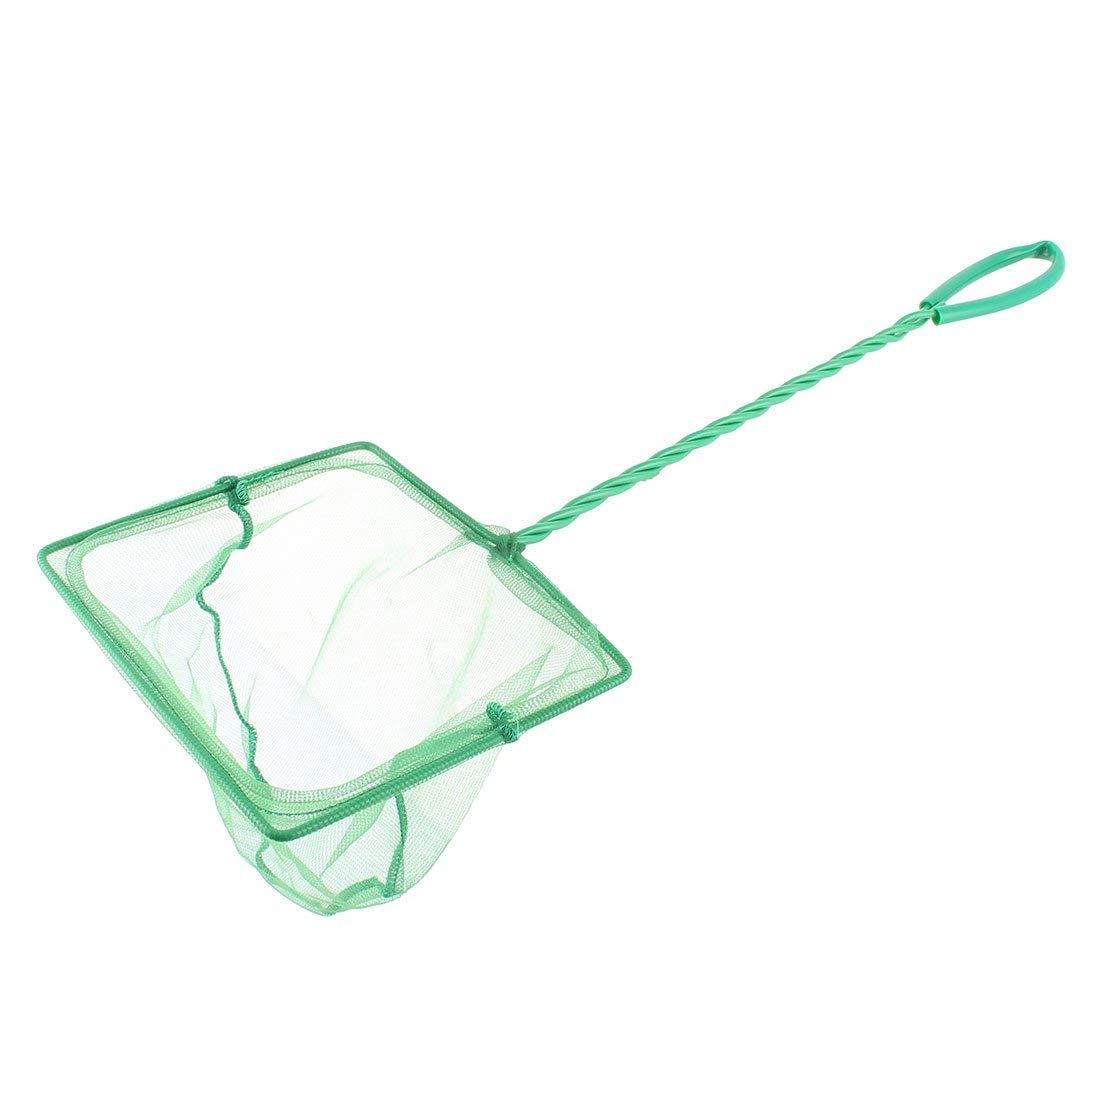 1Pc Plastic Household Coated Handle goldfish Fishing Landing Net Green for Fish Tank